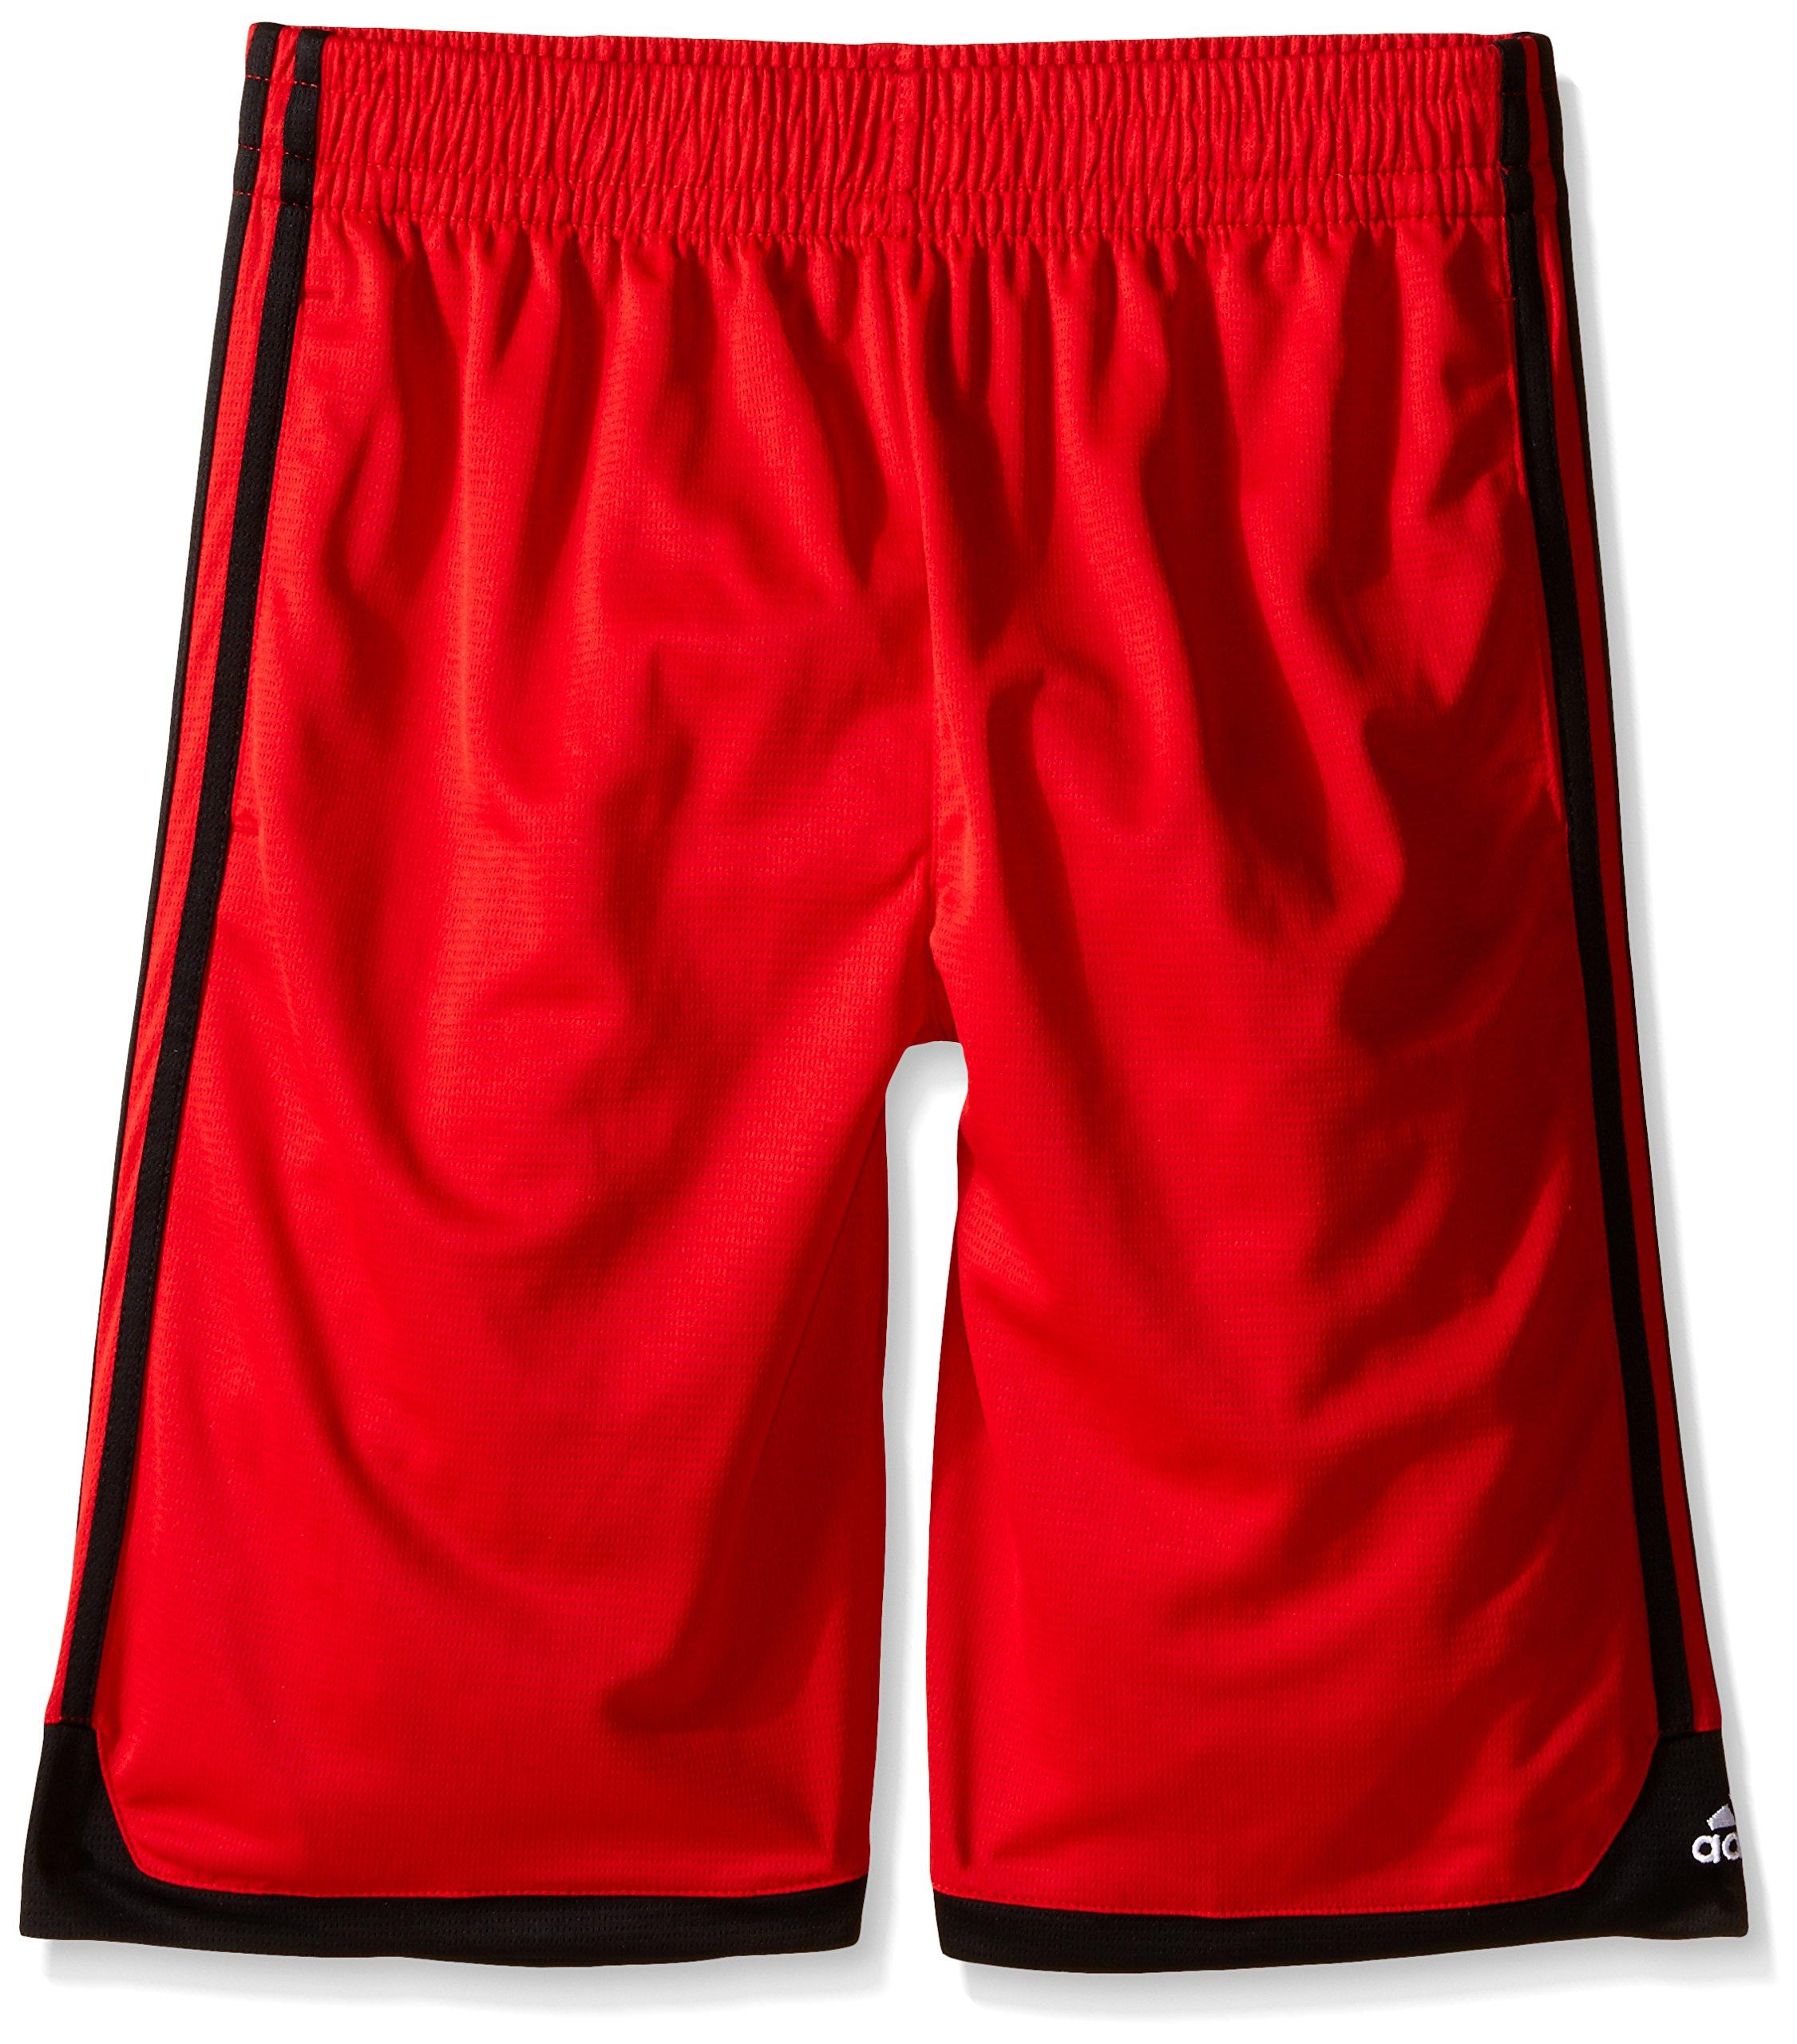 adidas Big Boys' Key Item Short, Light Scarlet/Black, X-Large/18